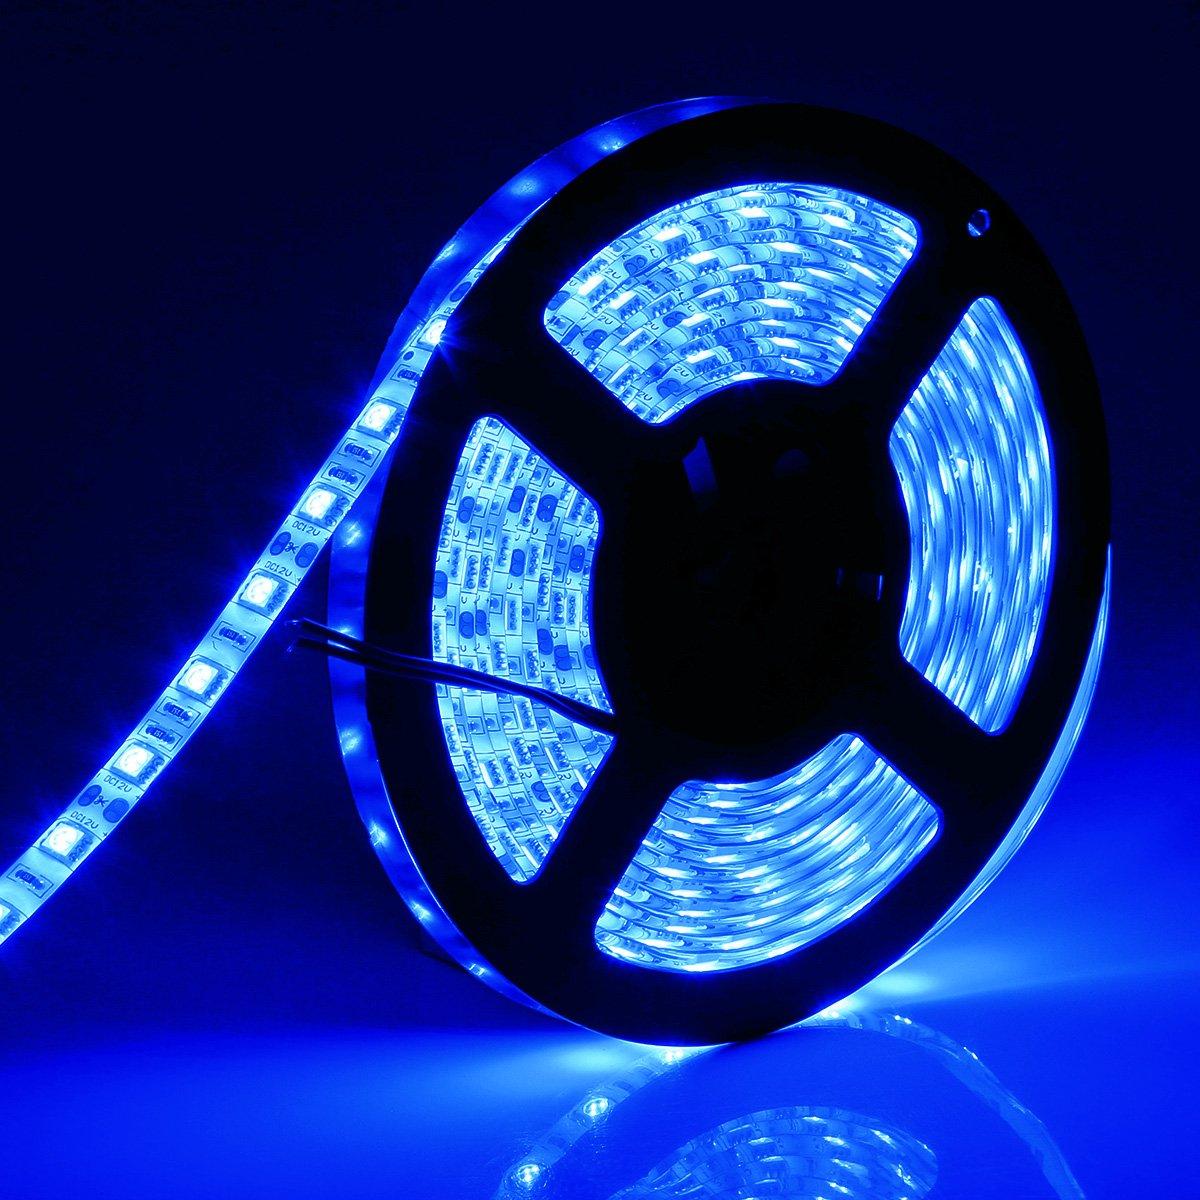 SUPERNIGHT 16.4ft/5M SMD 5050 60Leds/M Blue Waterproof Led Flexible Flash Strip 300 Leds LED Light Strip by SUPERNIGHT